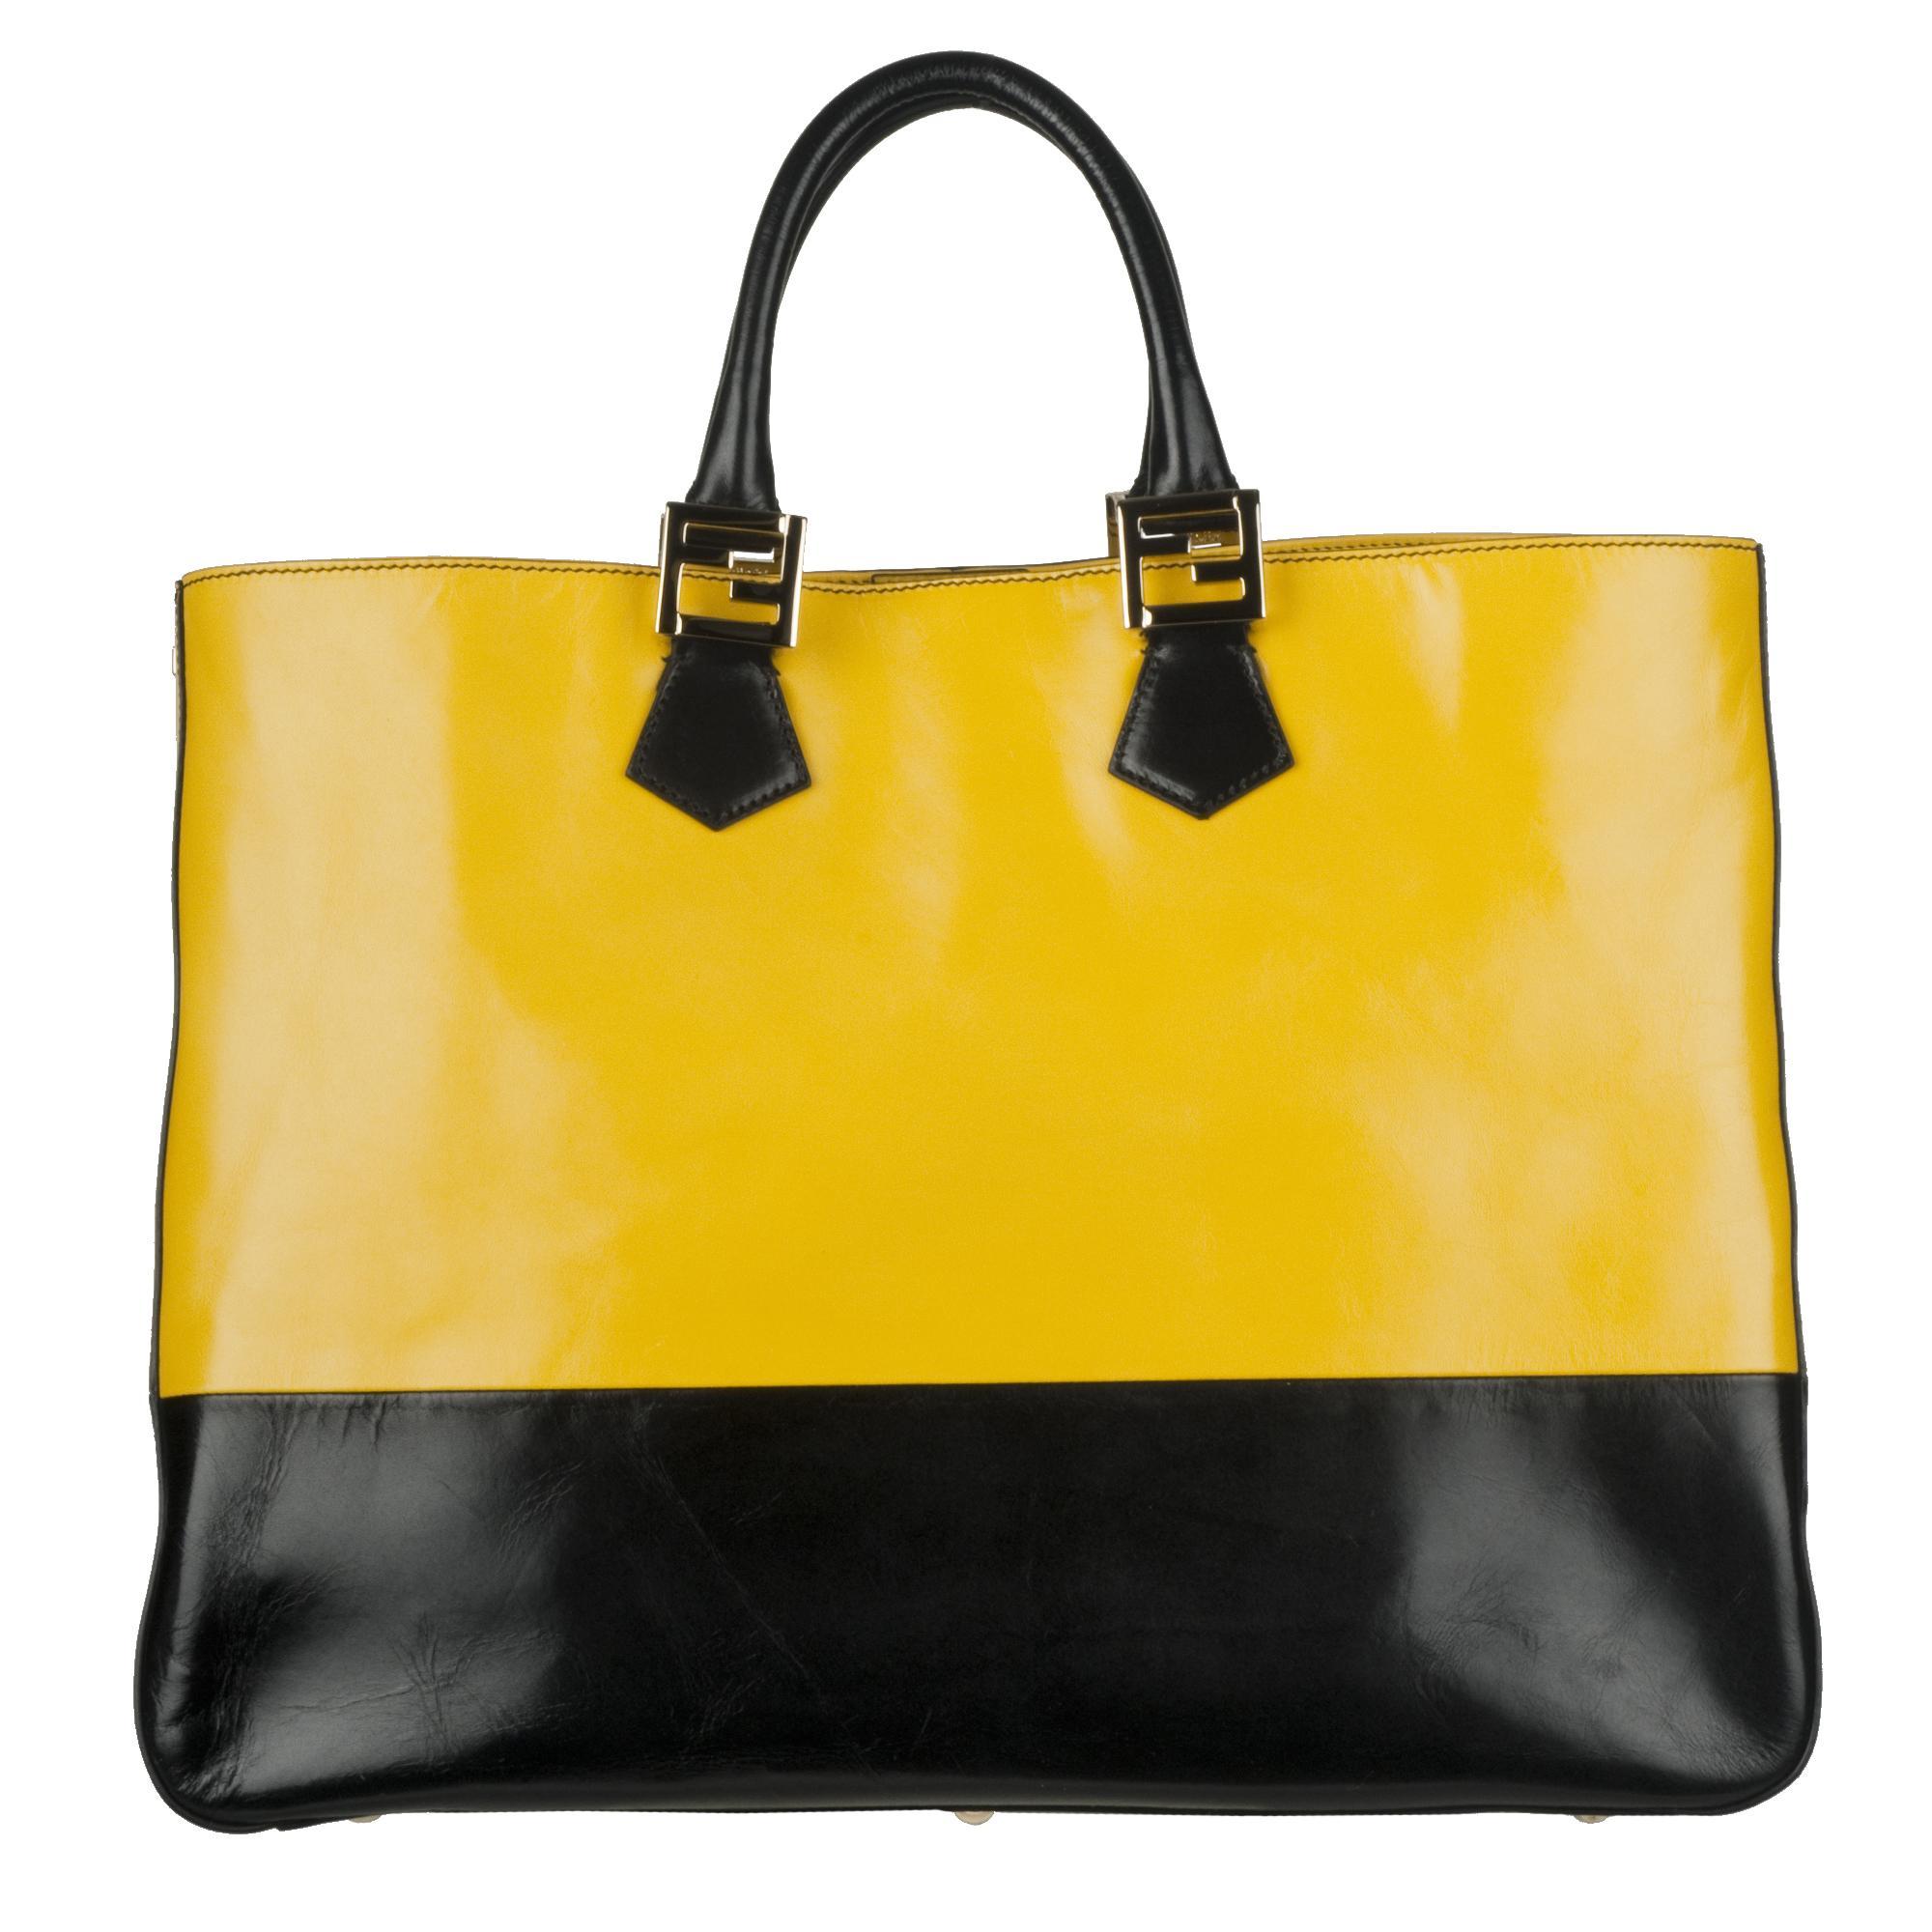 ... good fendi twins yellow leather tote bag 42ed0 fcbc2 7484359d0cc7e